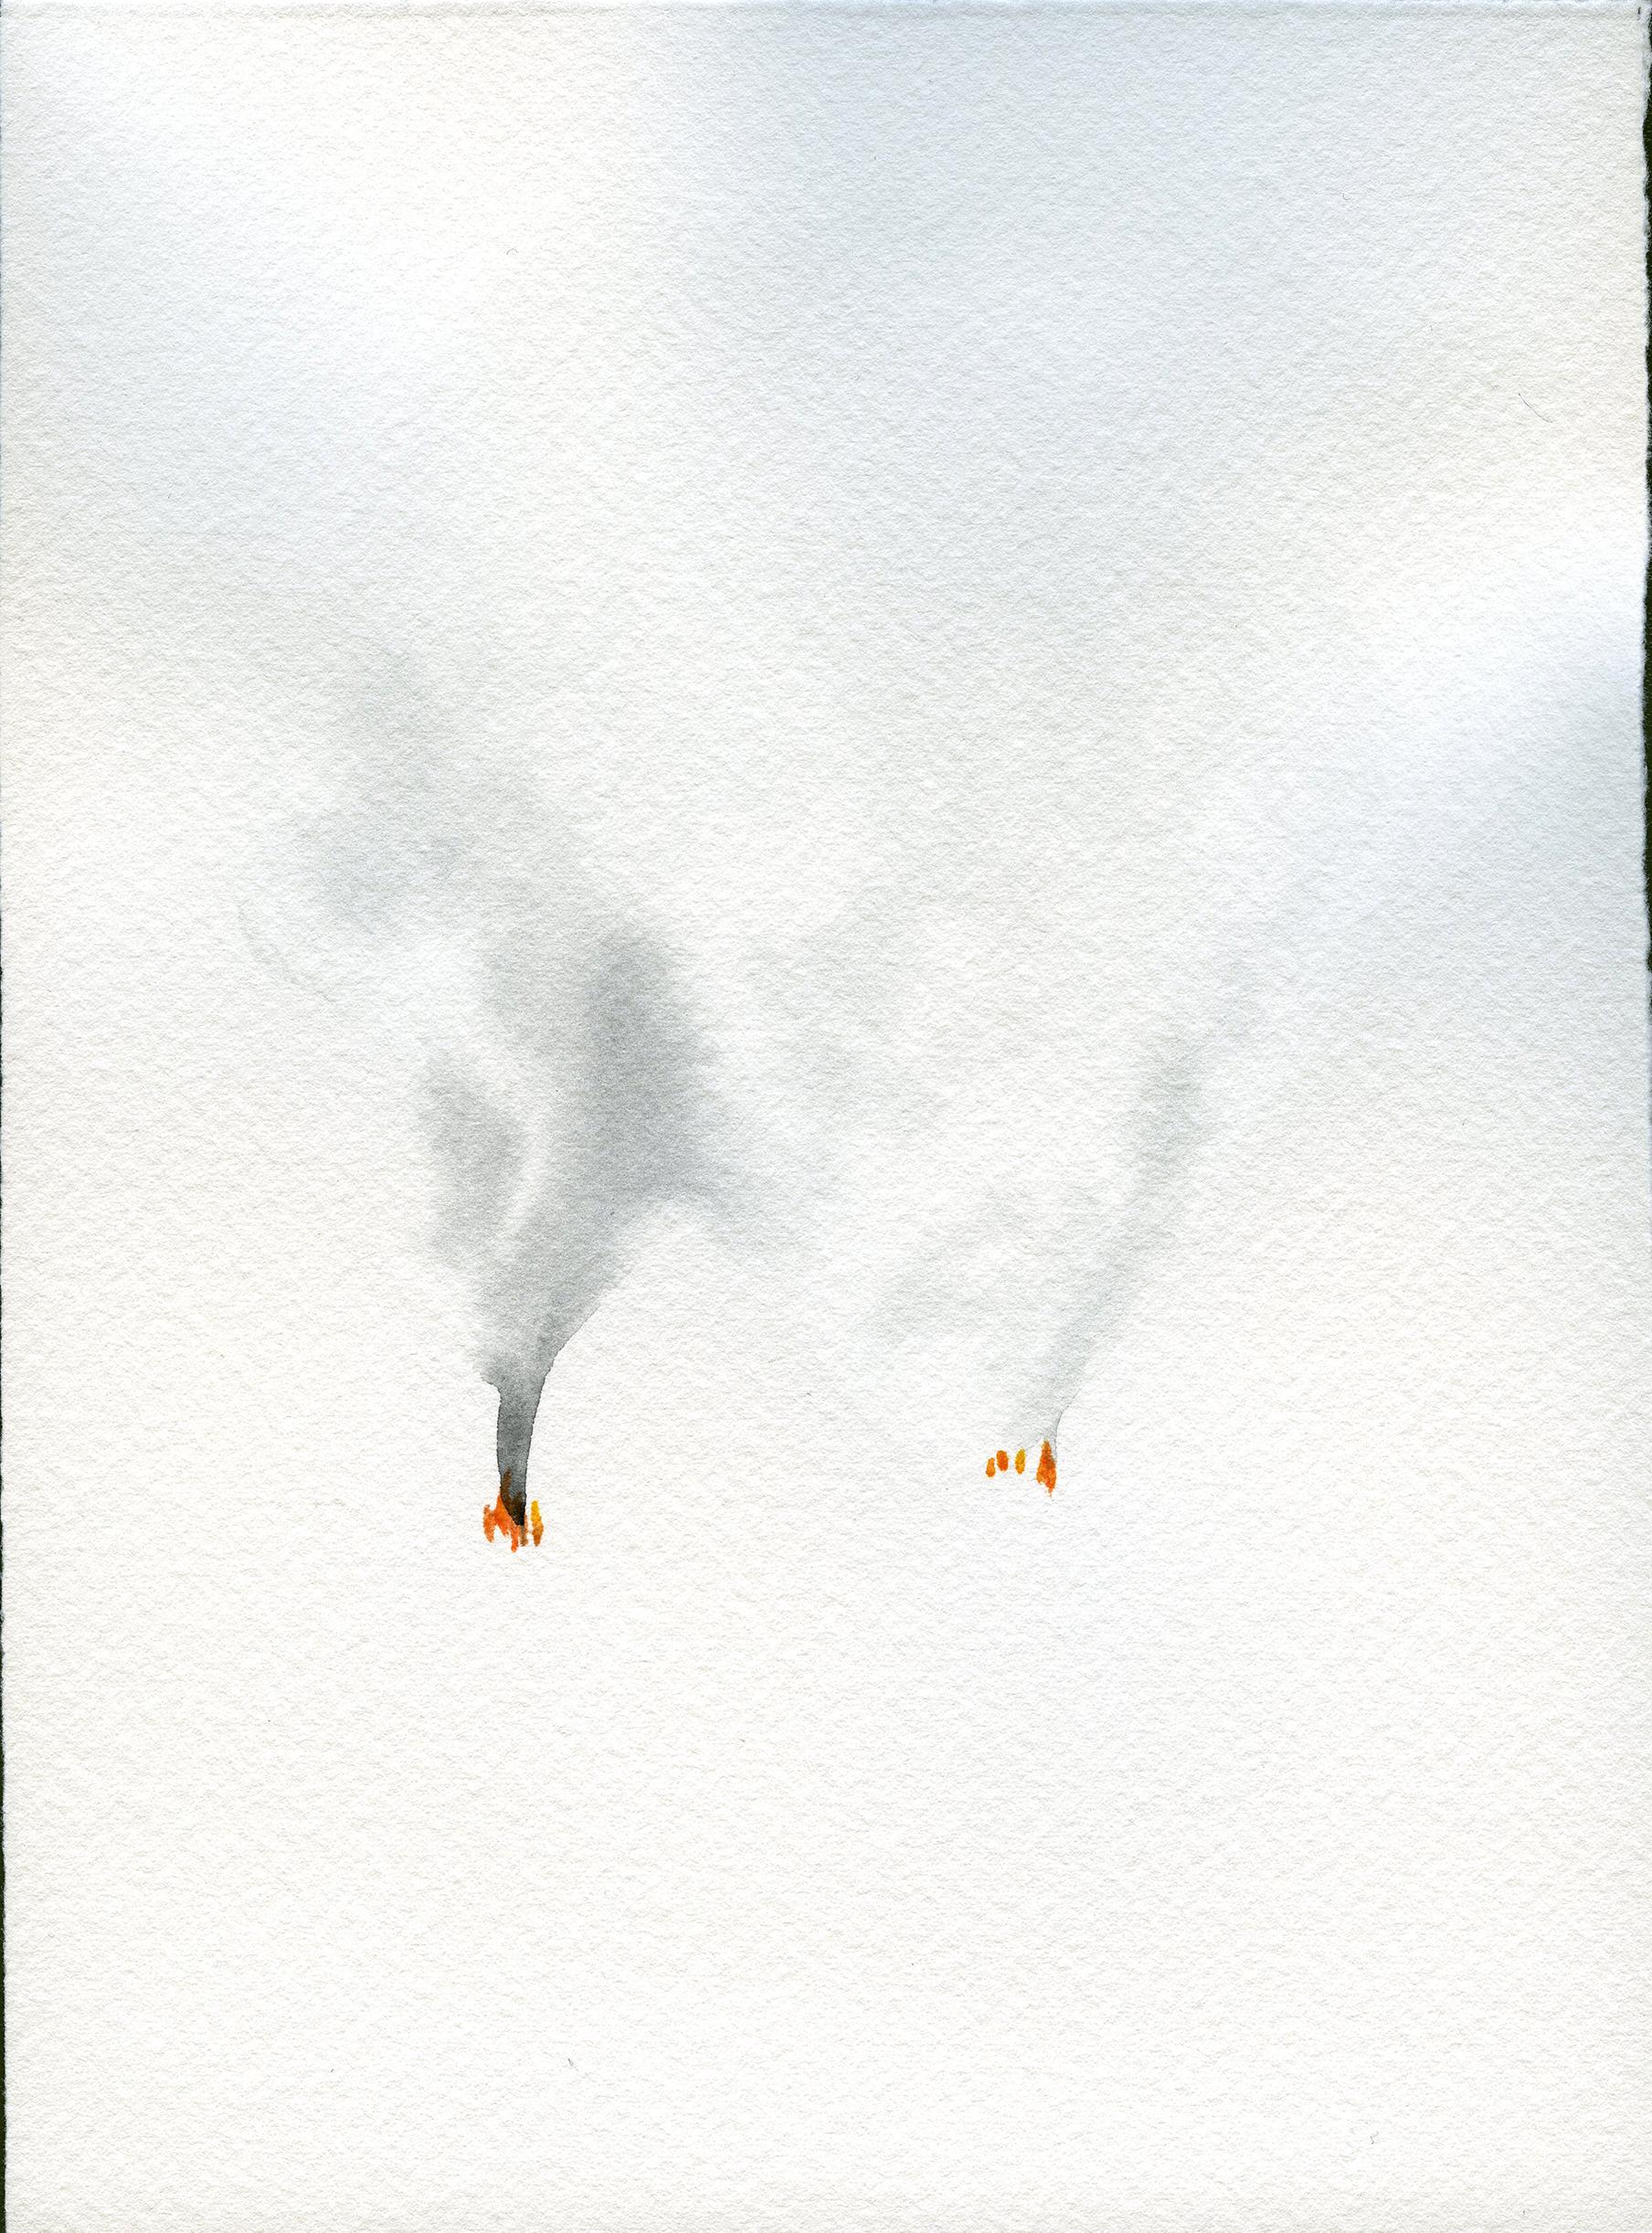 burn005.jpg